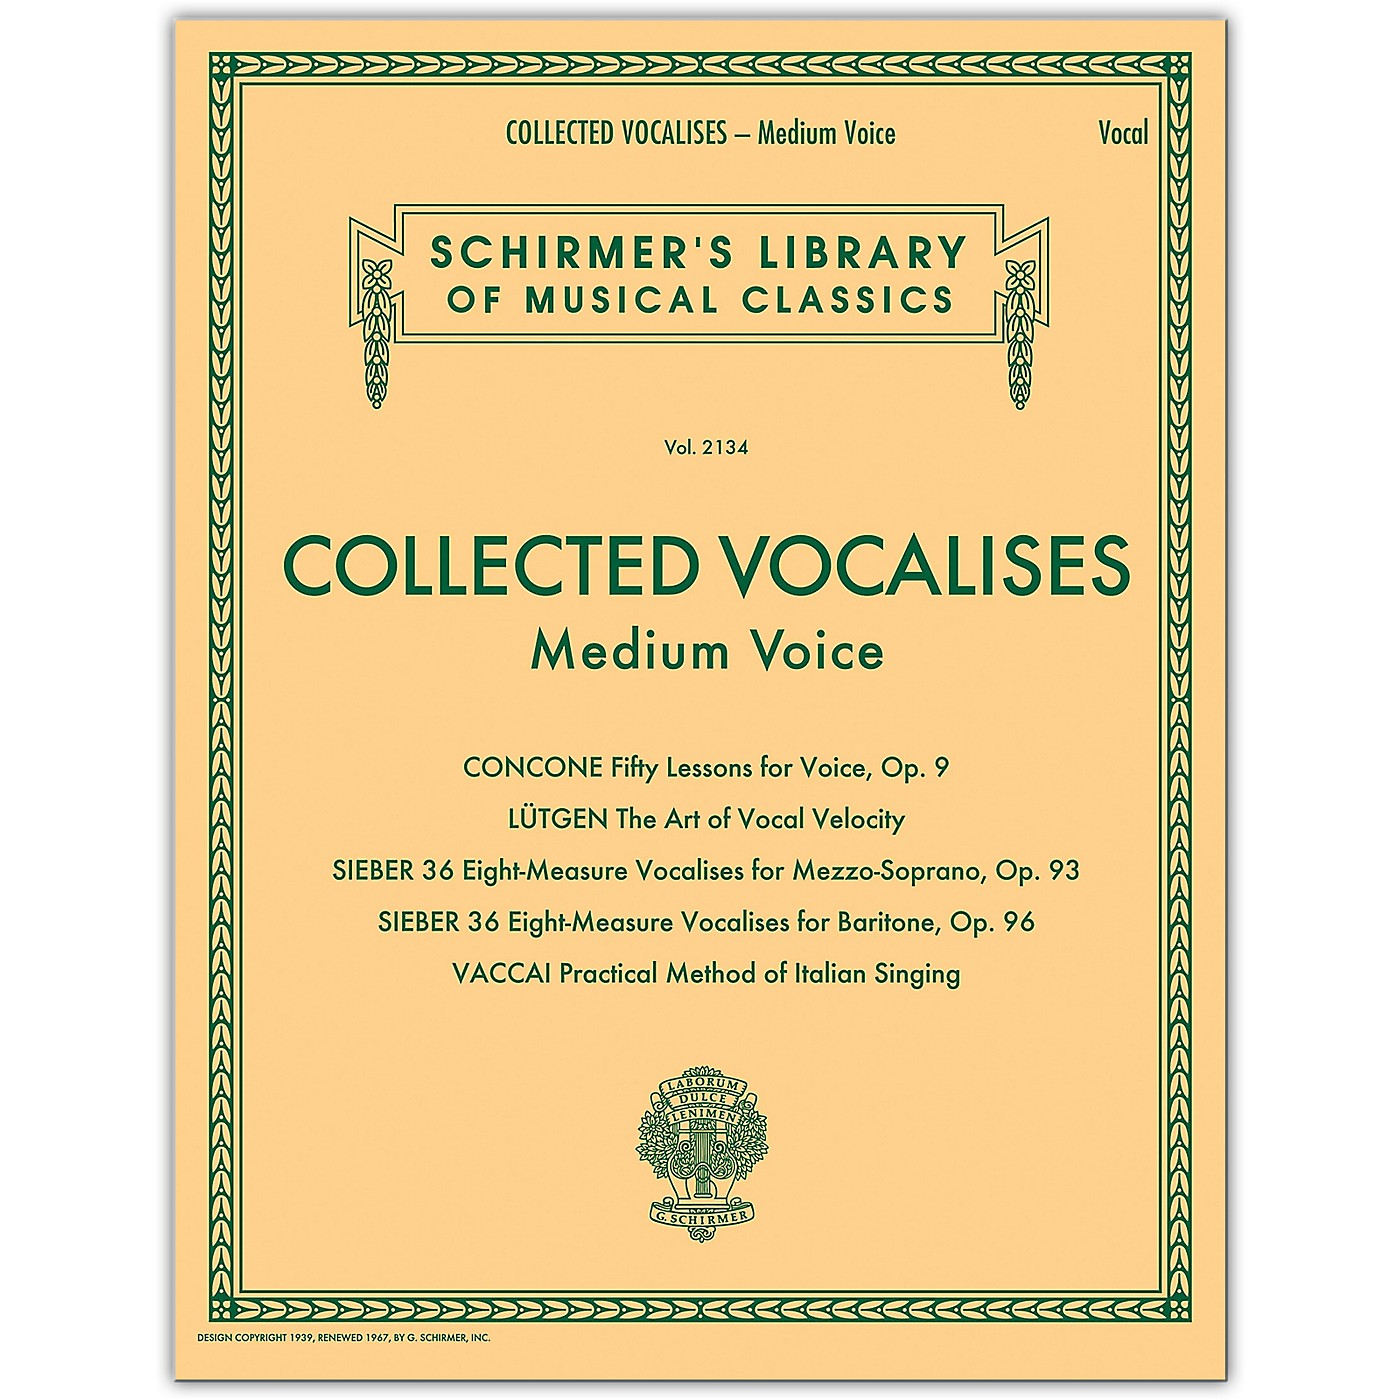 G. Schirmer Collected Vocalises: Medium Voice - Concone, Lutgen, Sieber, Vaccai thumbnail